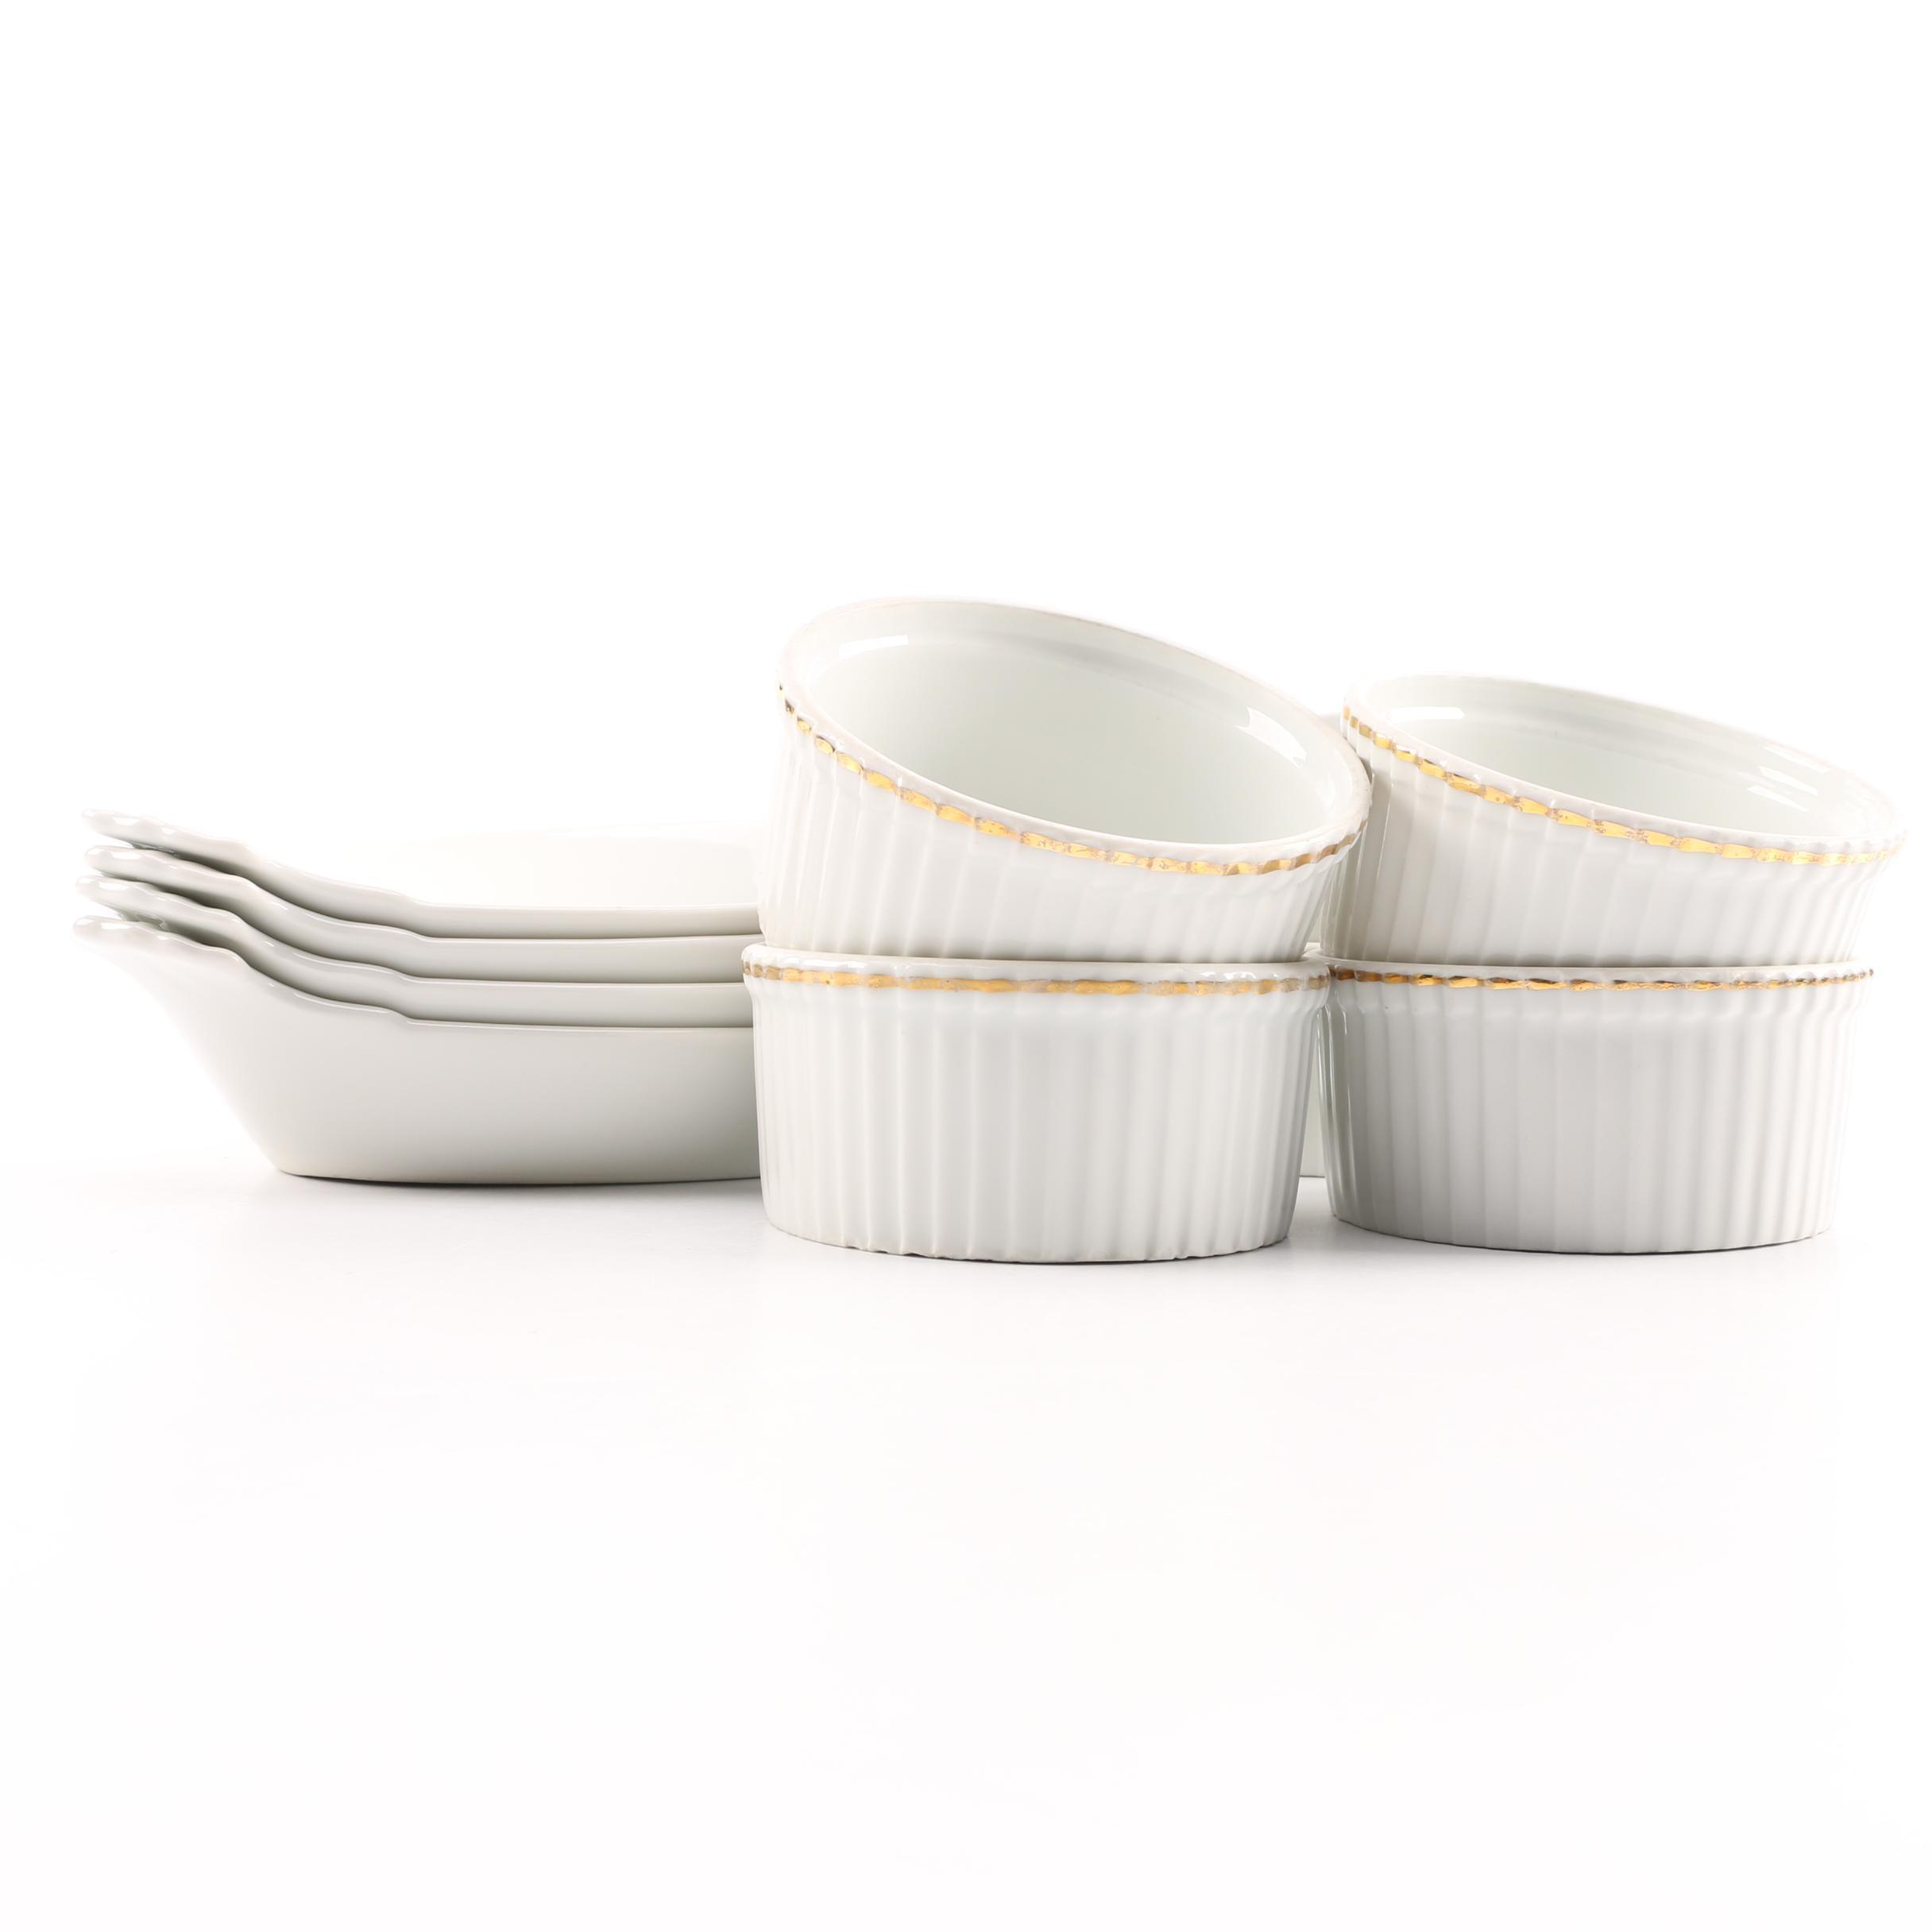 Apilco Porcelain Ramekins and Au Gratin Dishes ...  sc 1 st  EBTH.com & Apilco Porcelain Ramekins and Au Gratin Dishes : EBTH